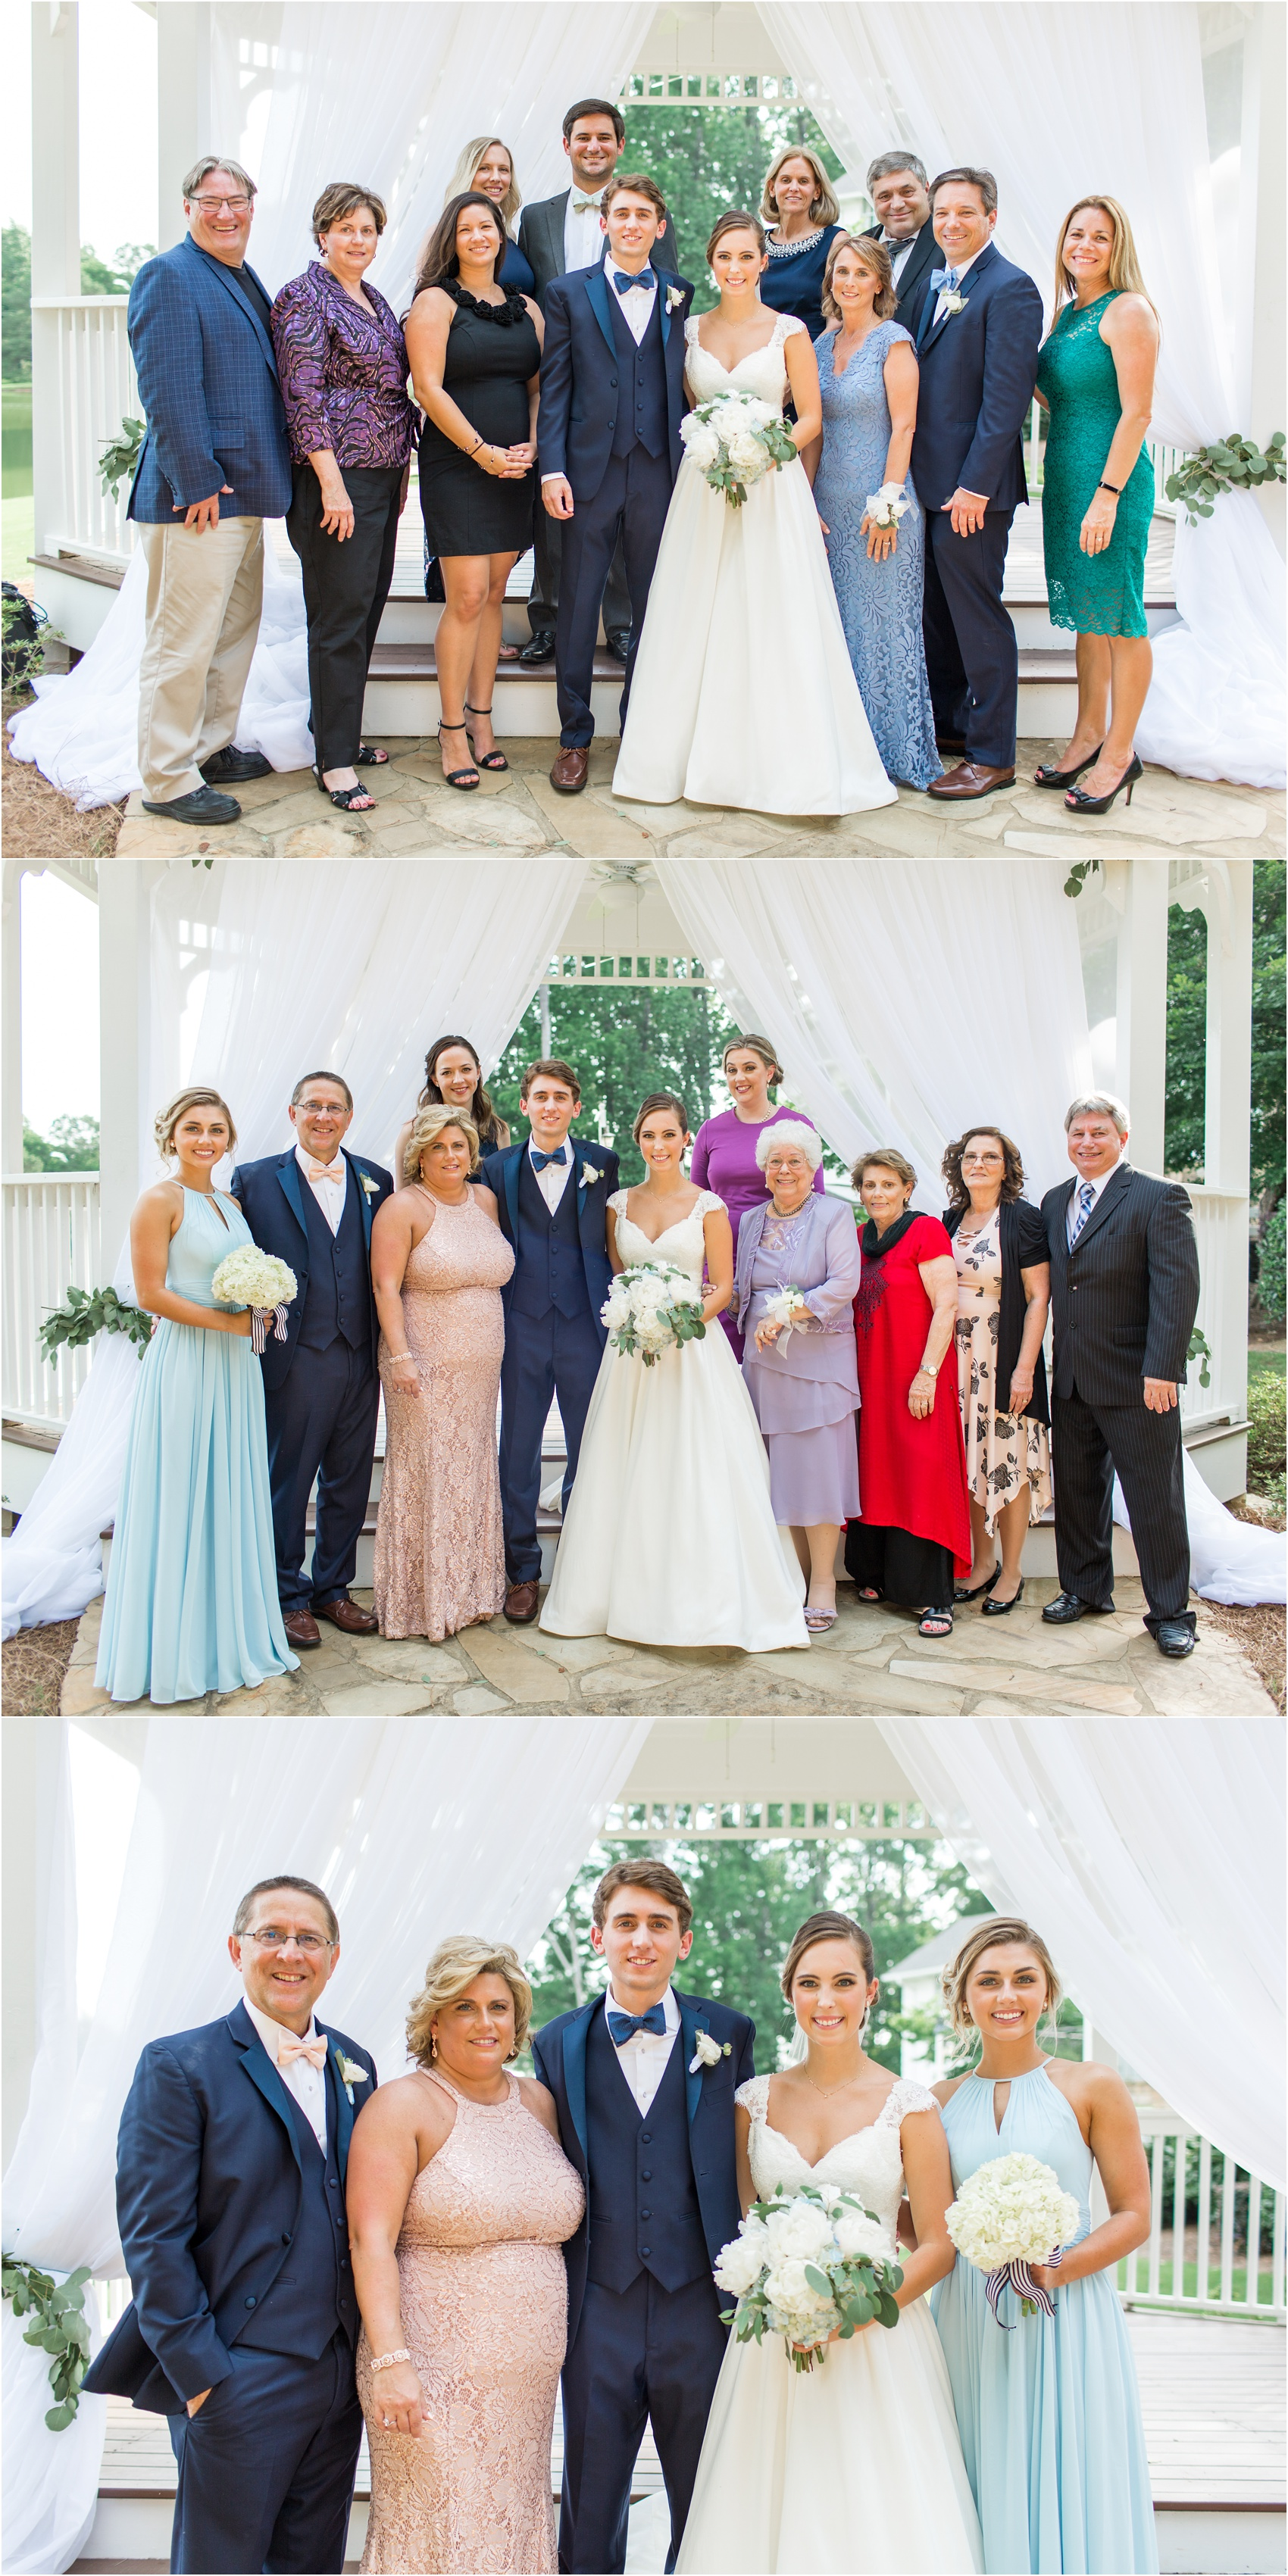 Savannah Eve Photography- Sigl-Adams Wedding- Sneak Peek-45.jpg